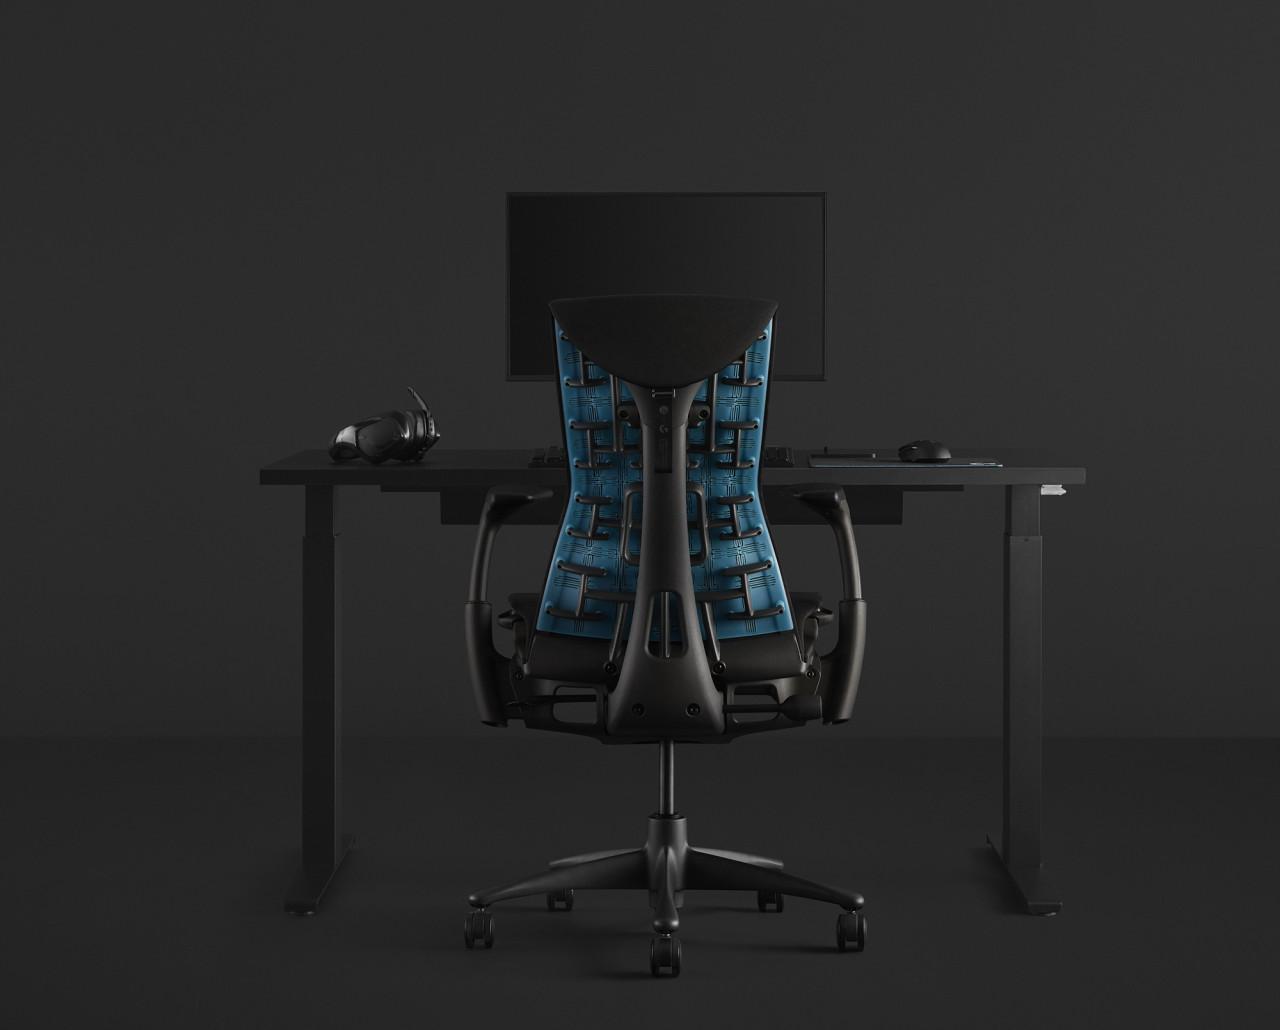 The Herman Miller x Logitech G Embody Chair Takes Aim at Gaming Ergonomics